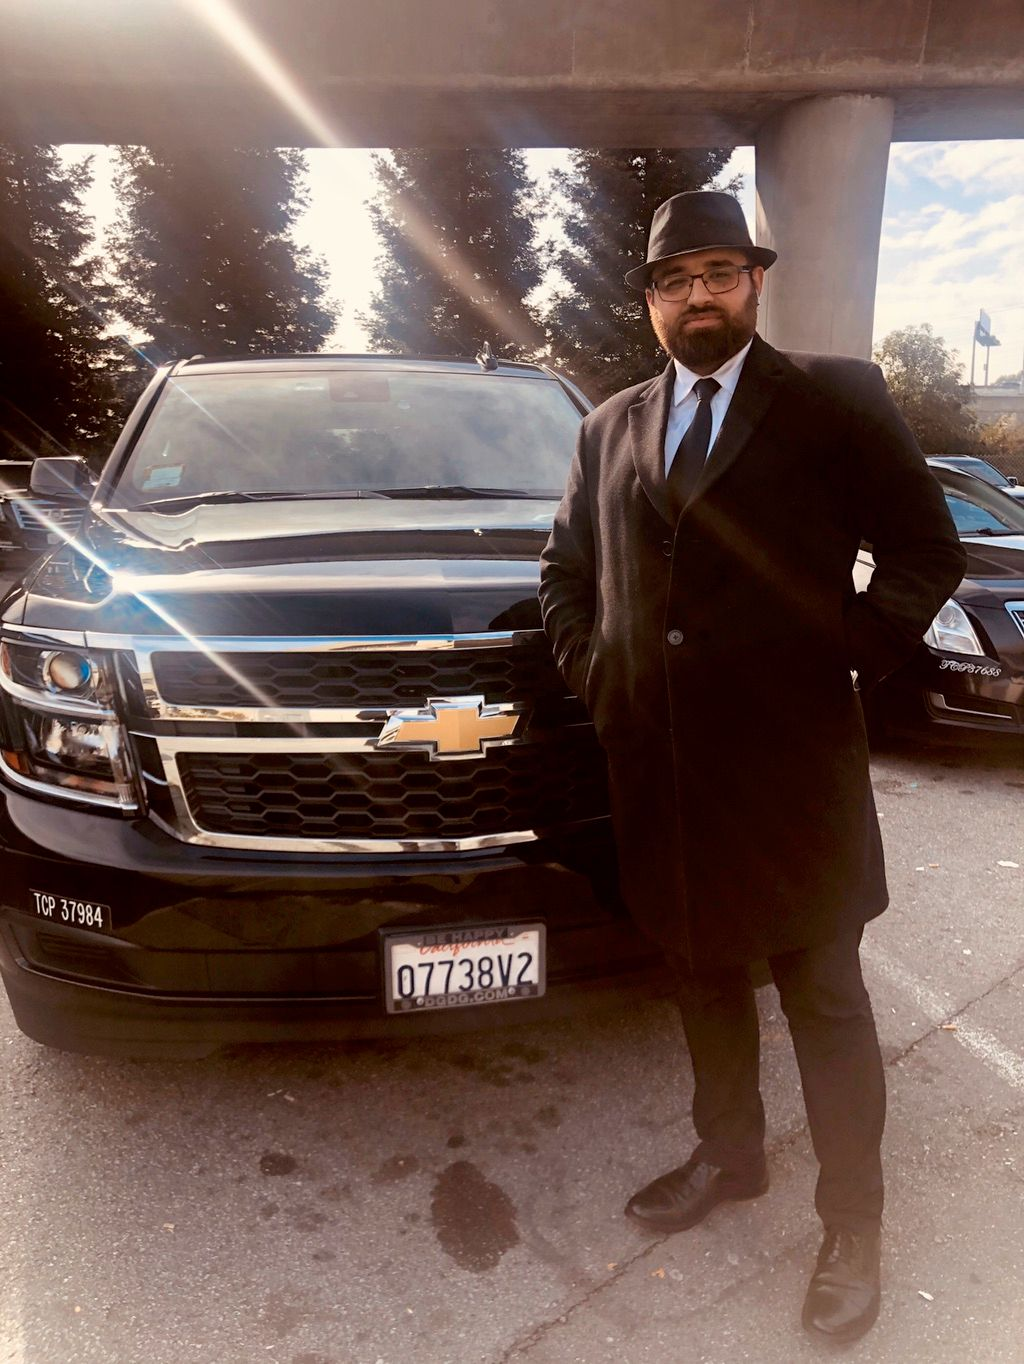 SF limousine/private chauffeur